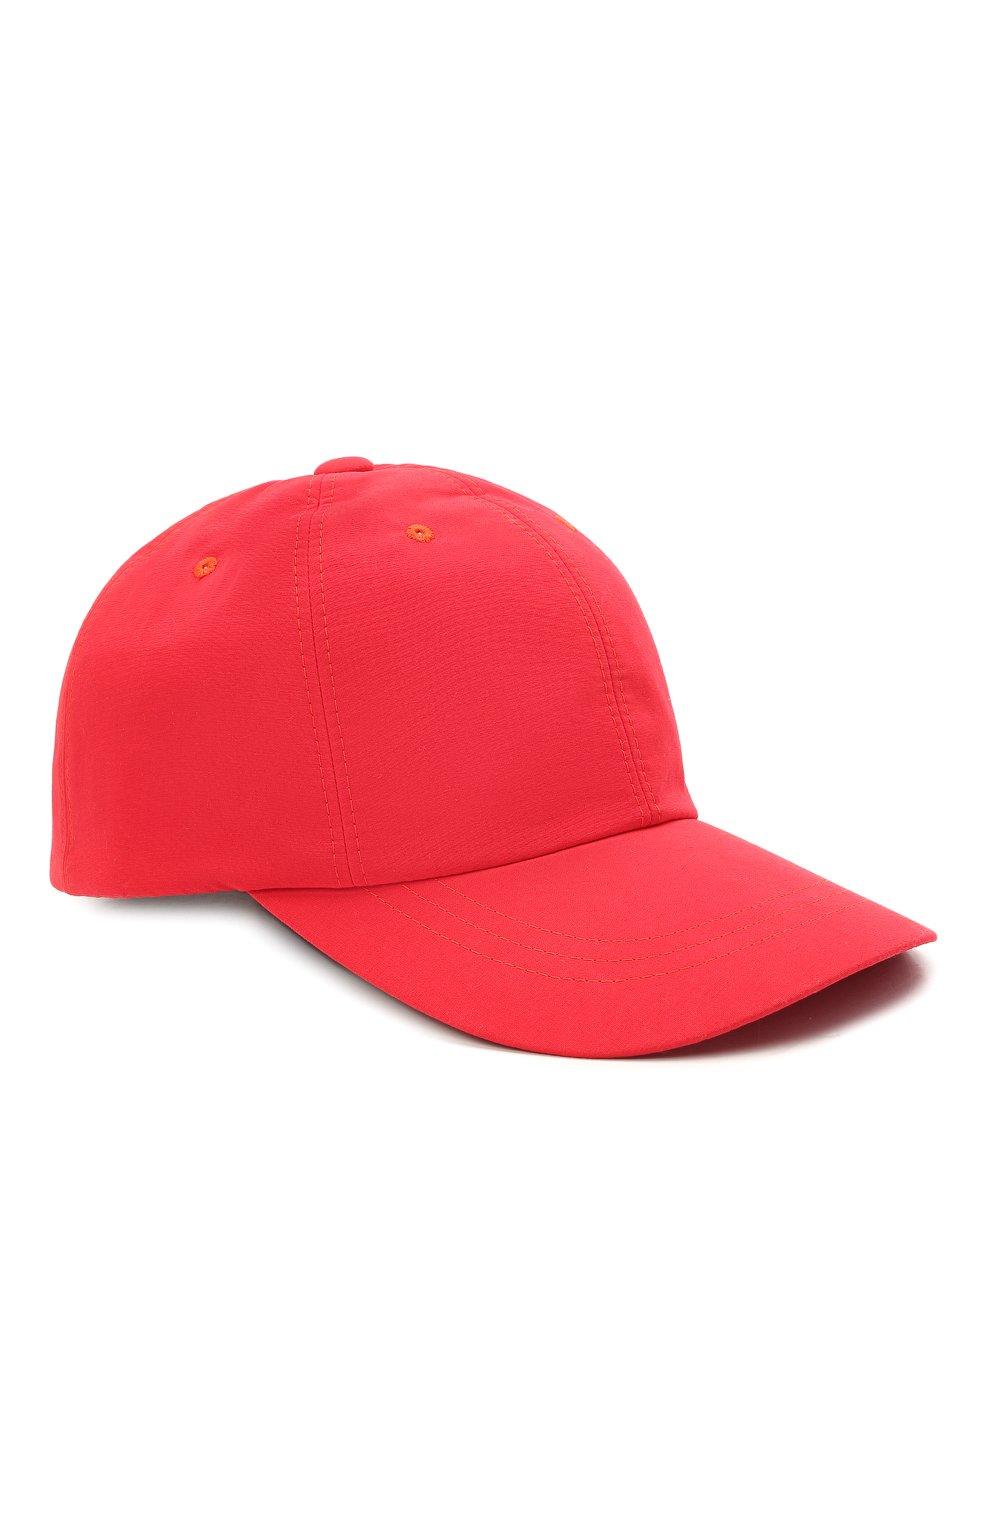 Мужской бейсболка ZILLI красного цвета, арт. MHV-CAP12-UNIC0/0001 | Фото 1 (Материал: Текстиль)